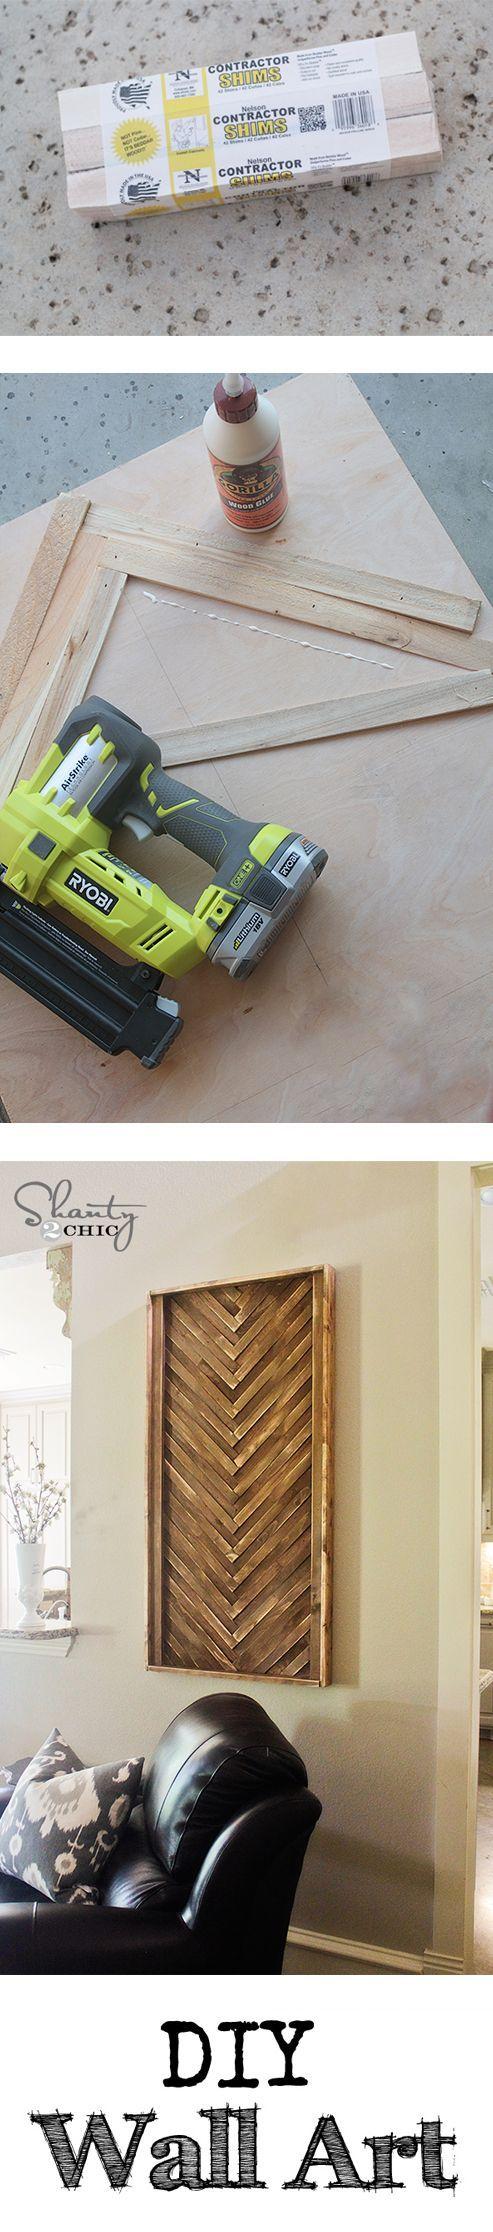 DIY Wall Art From Cheap Wood Shims Crafts Pinterest